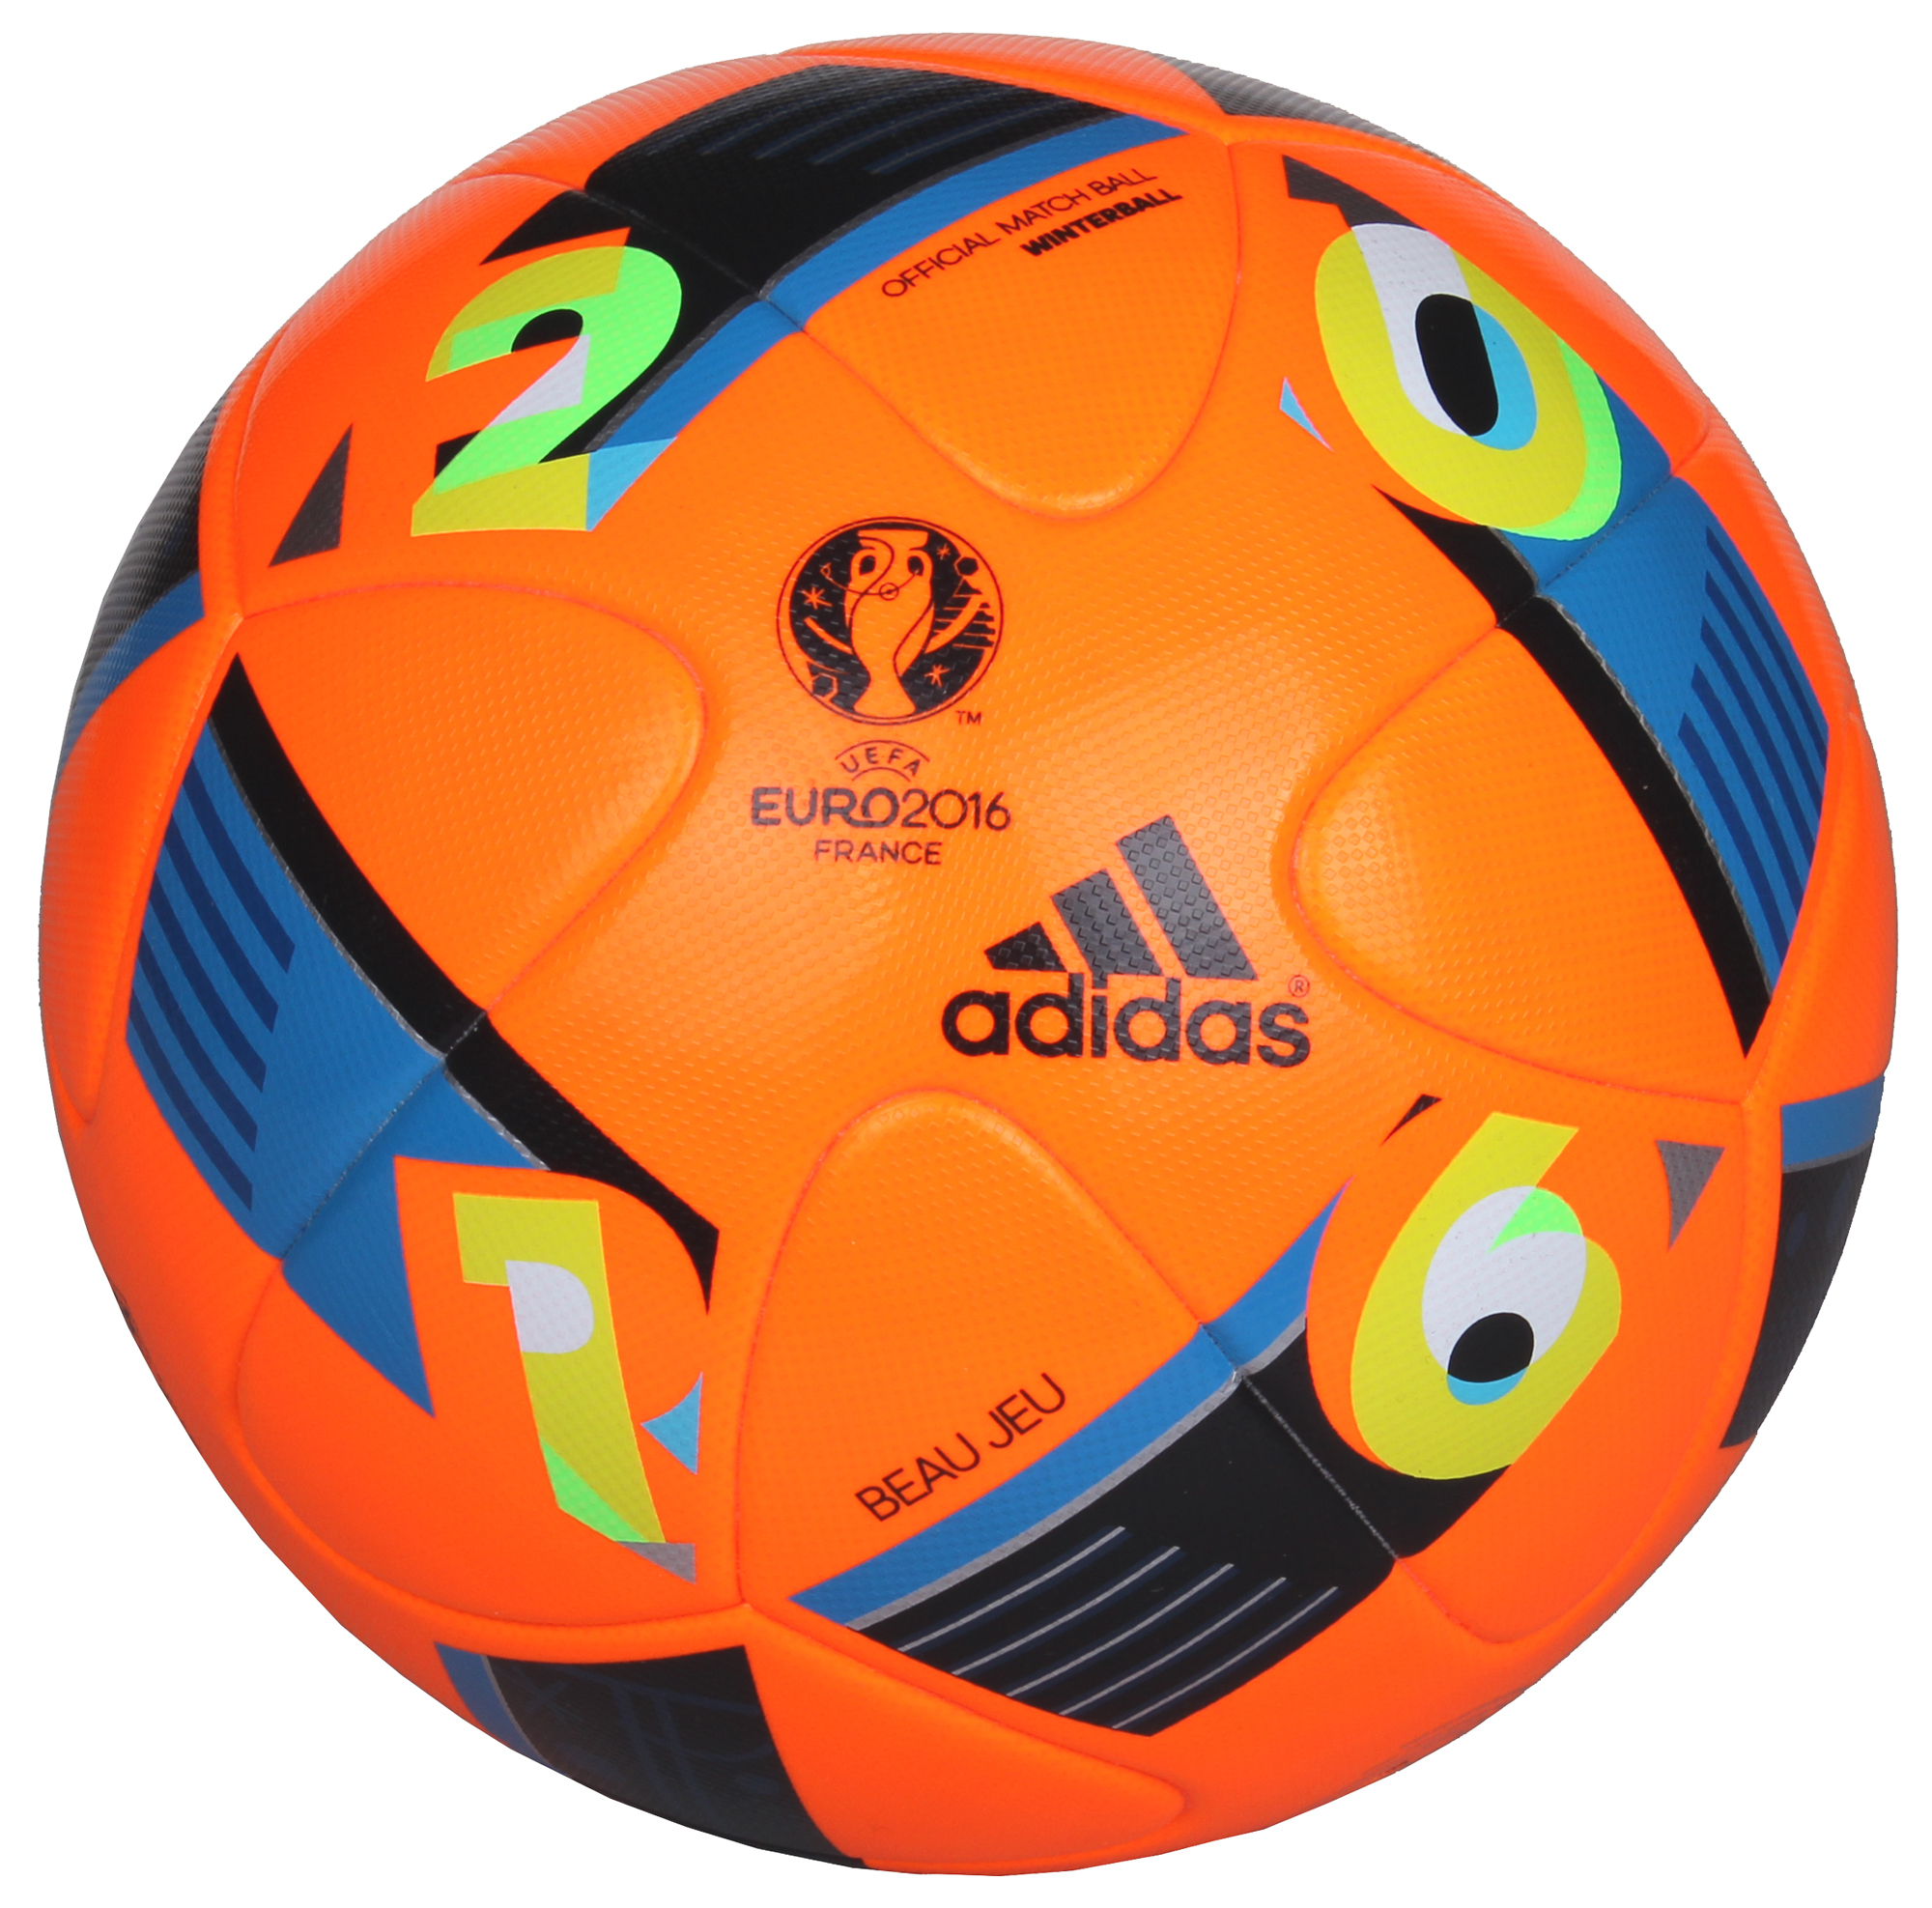 ADIDAS EURO 2016 OMB Winter fotbalový míč - vel. 5